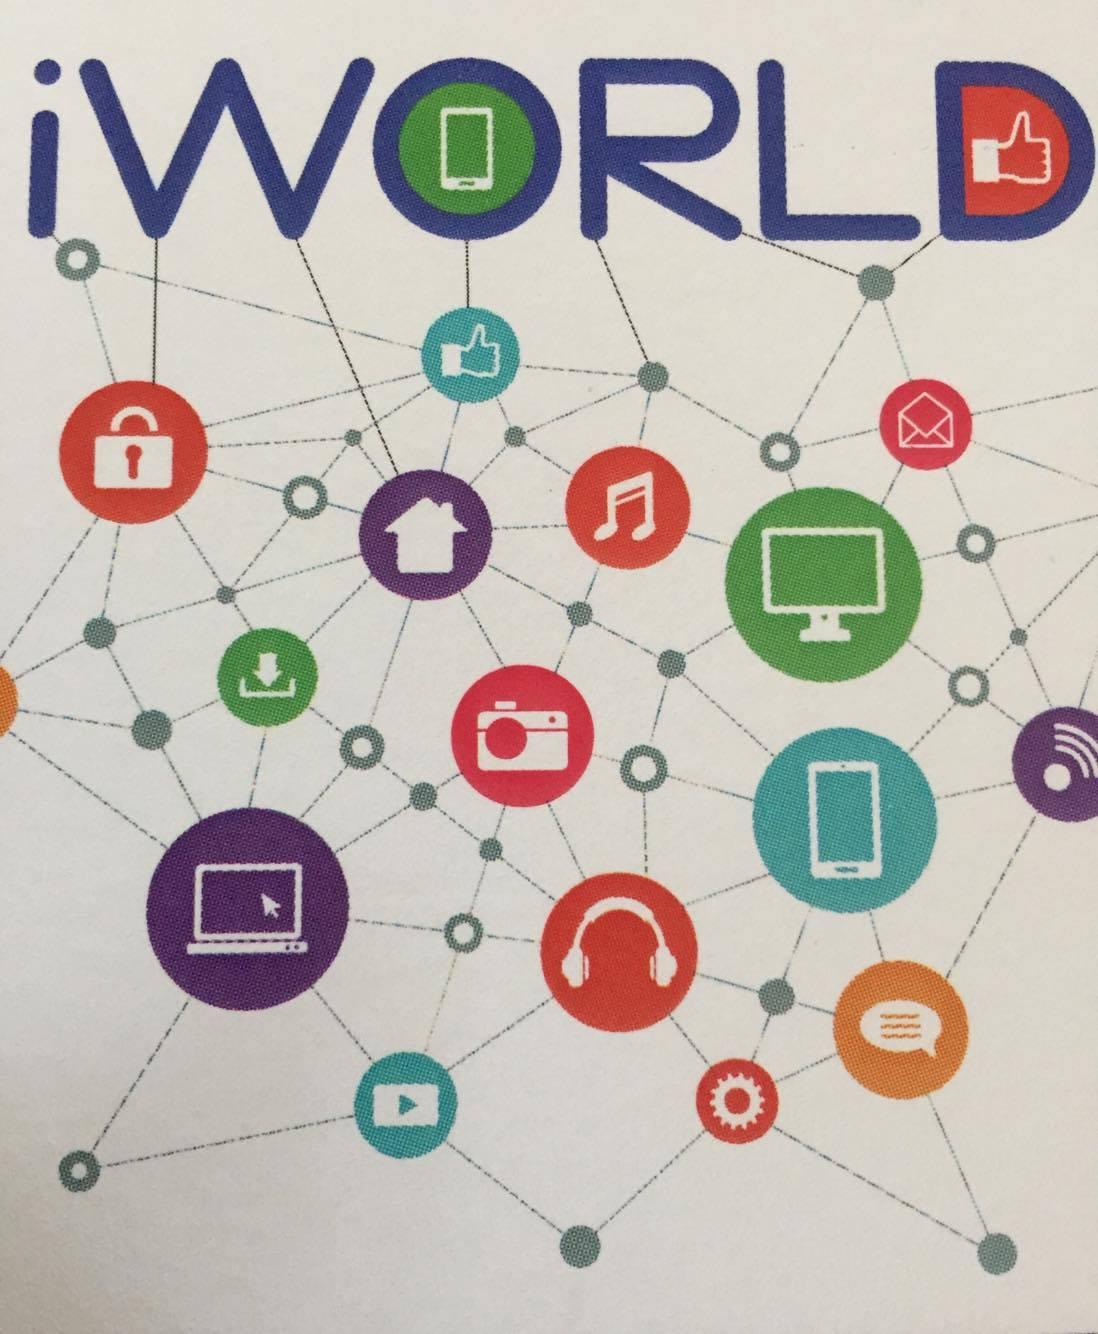 Tuesday - at iWorld